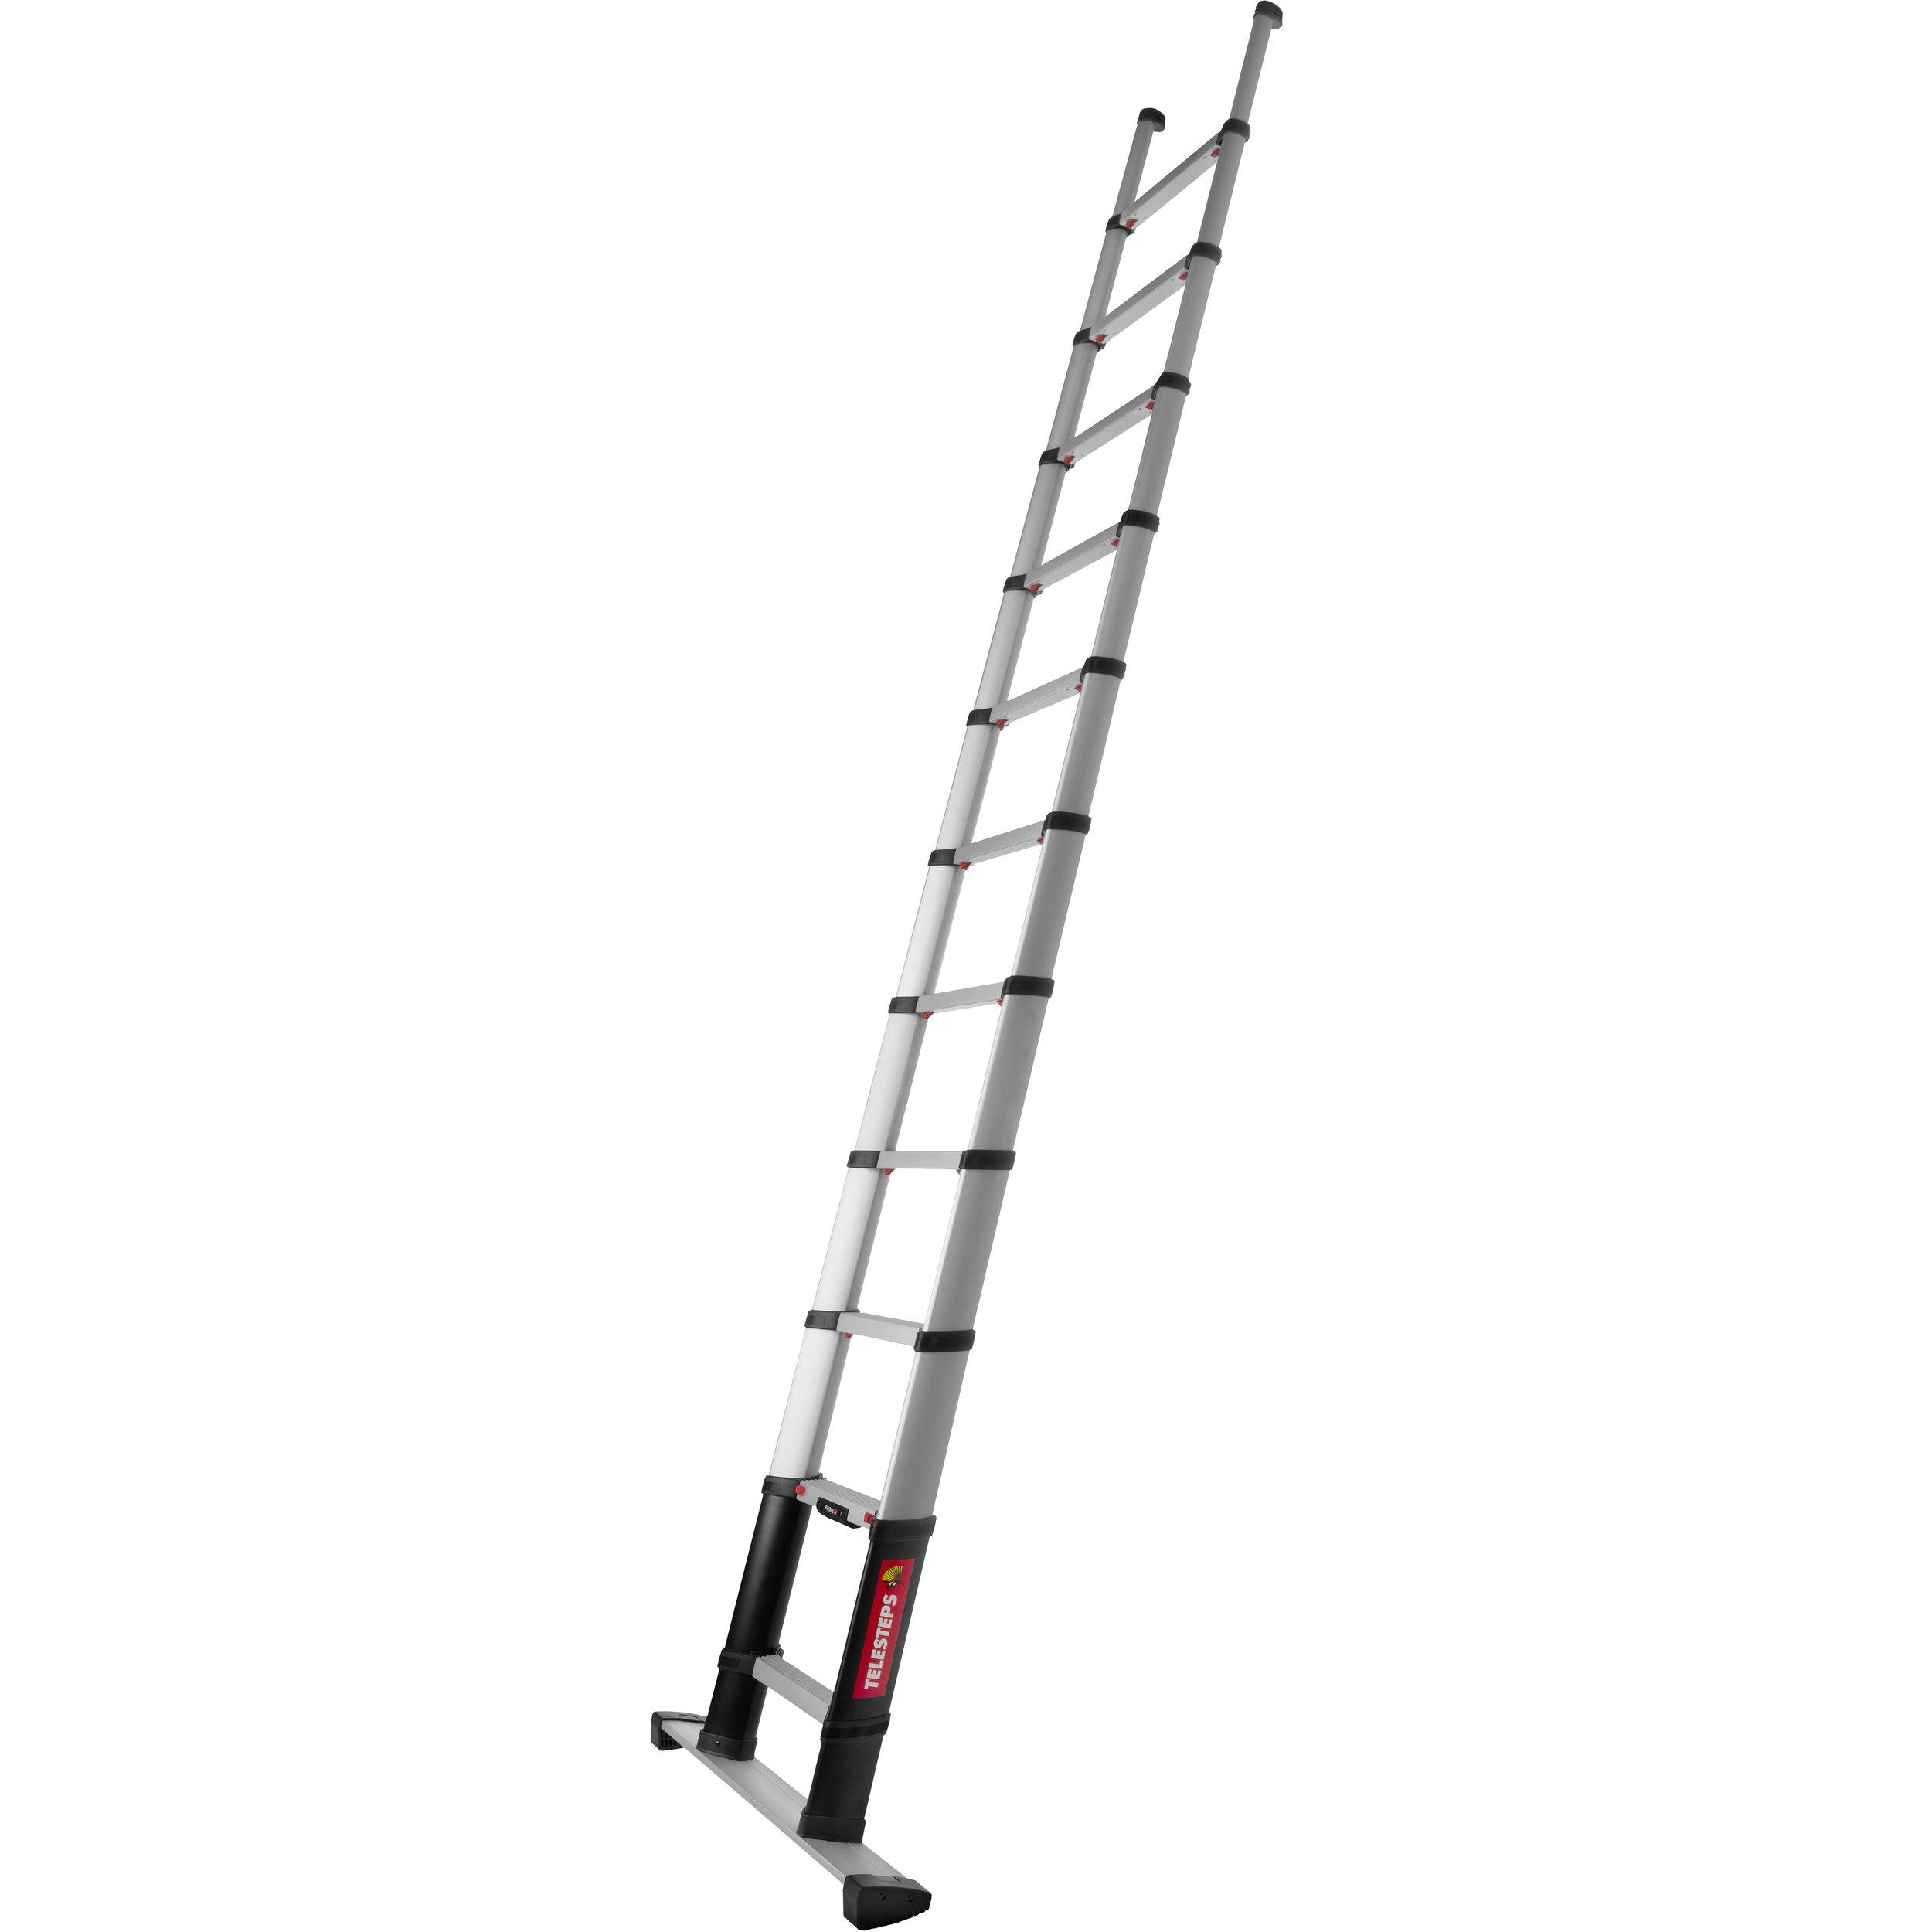 Telescopic single ladder | Single ladders | ZARGES